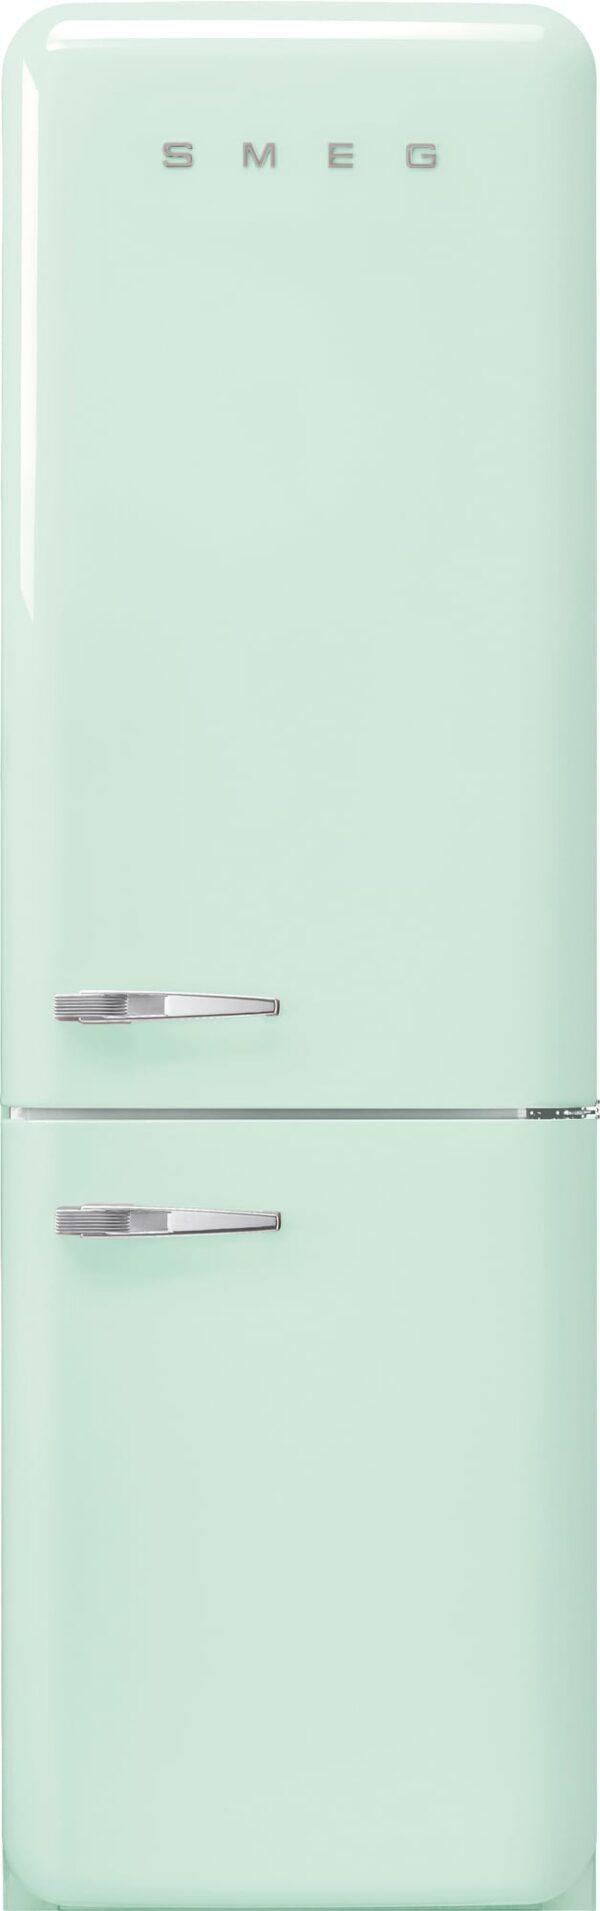 Smeg 50's Style kølefryseskab FAB32RPG5 (pastel green)